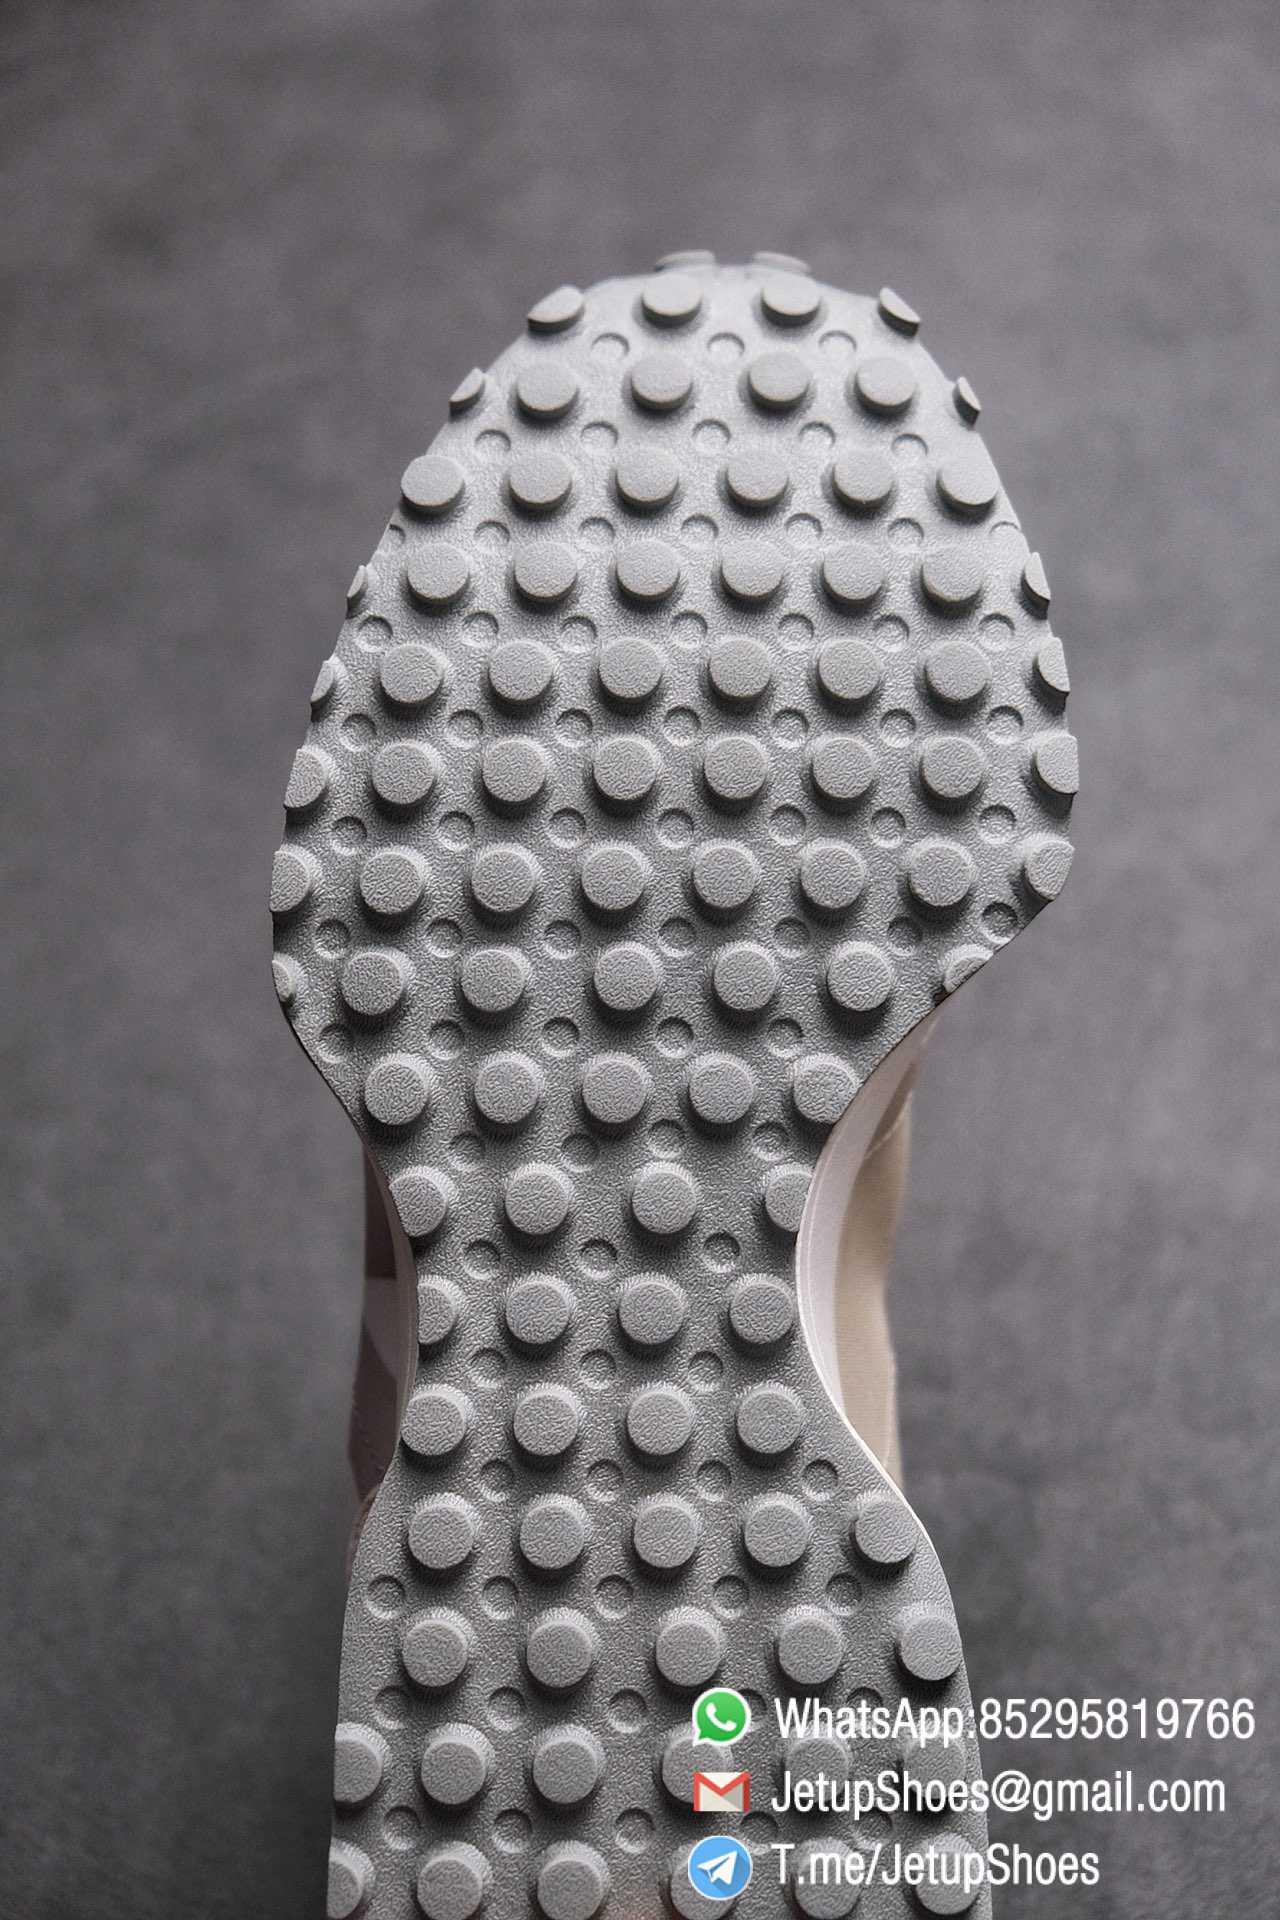 Replica Sneakers New Balance 327 Noritake x 327 Light Grey White Retro Running Shoes SKU MS327NW1 Best RepSneakers 09